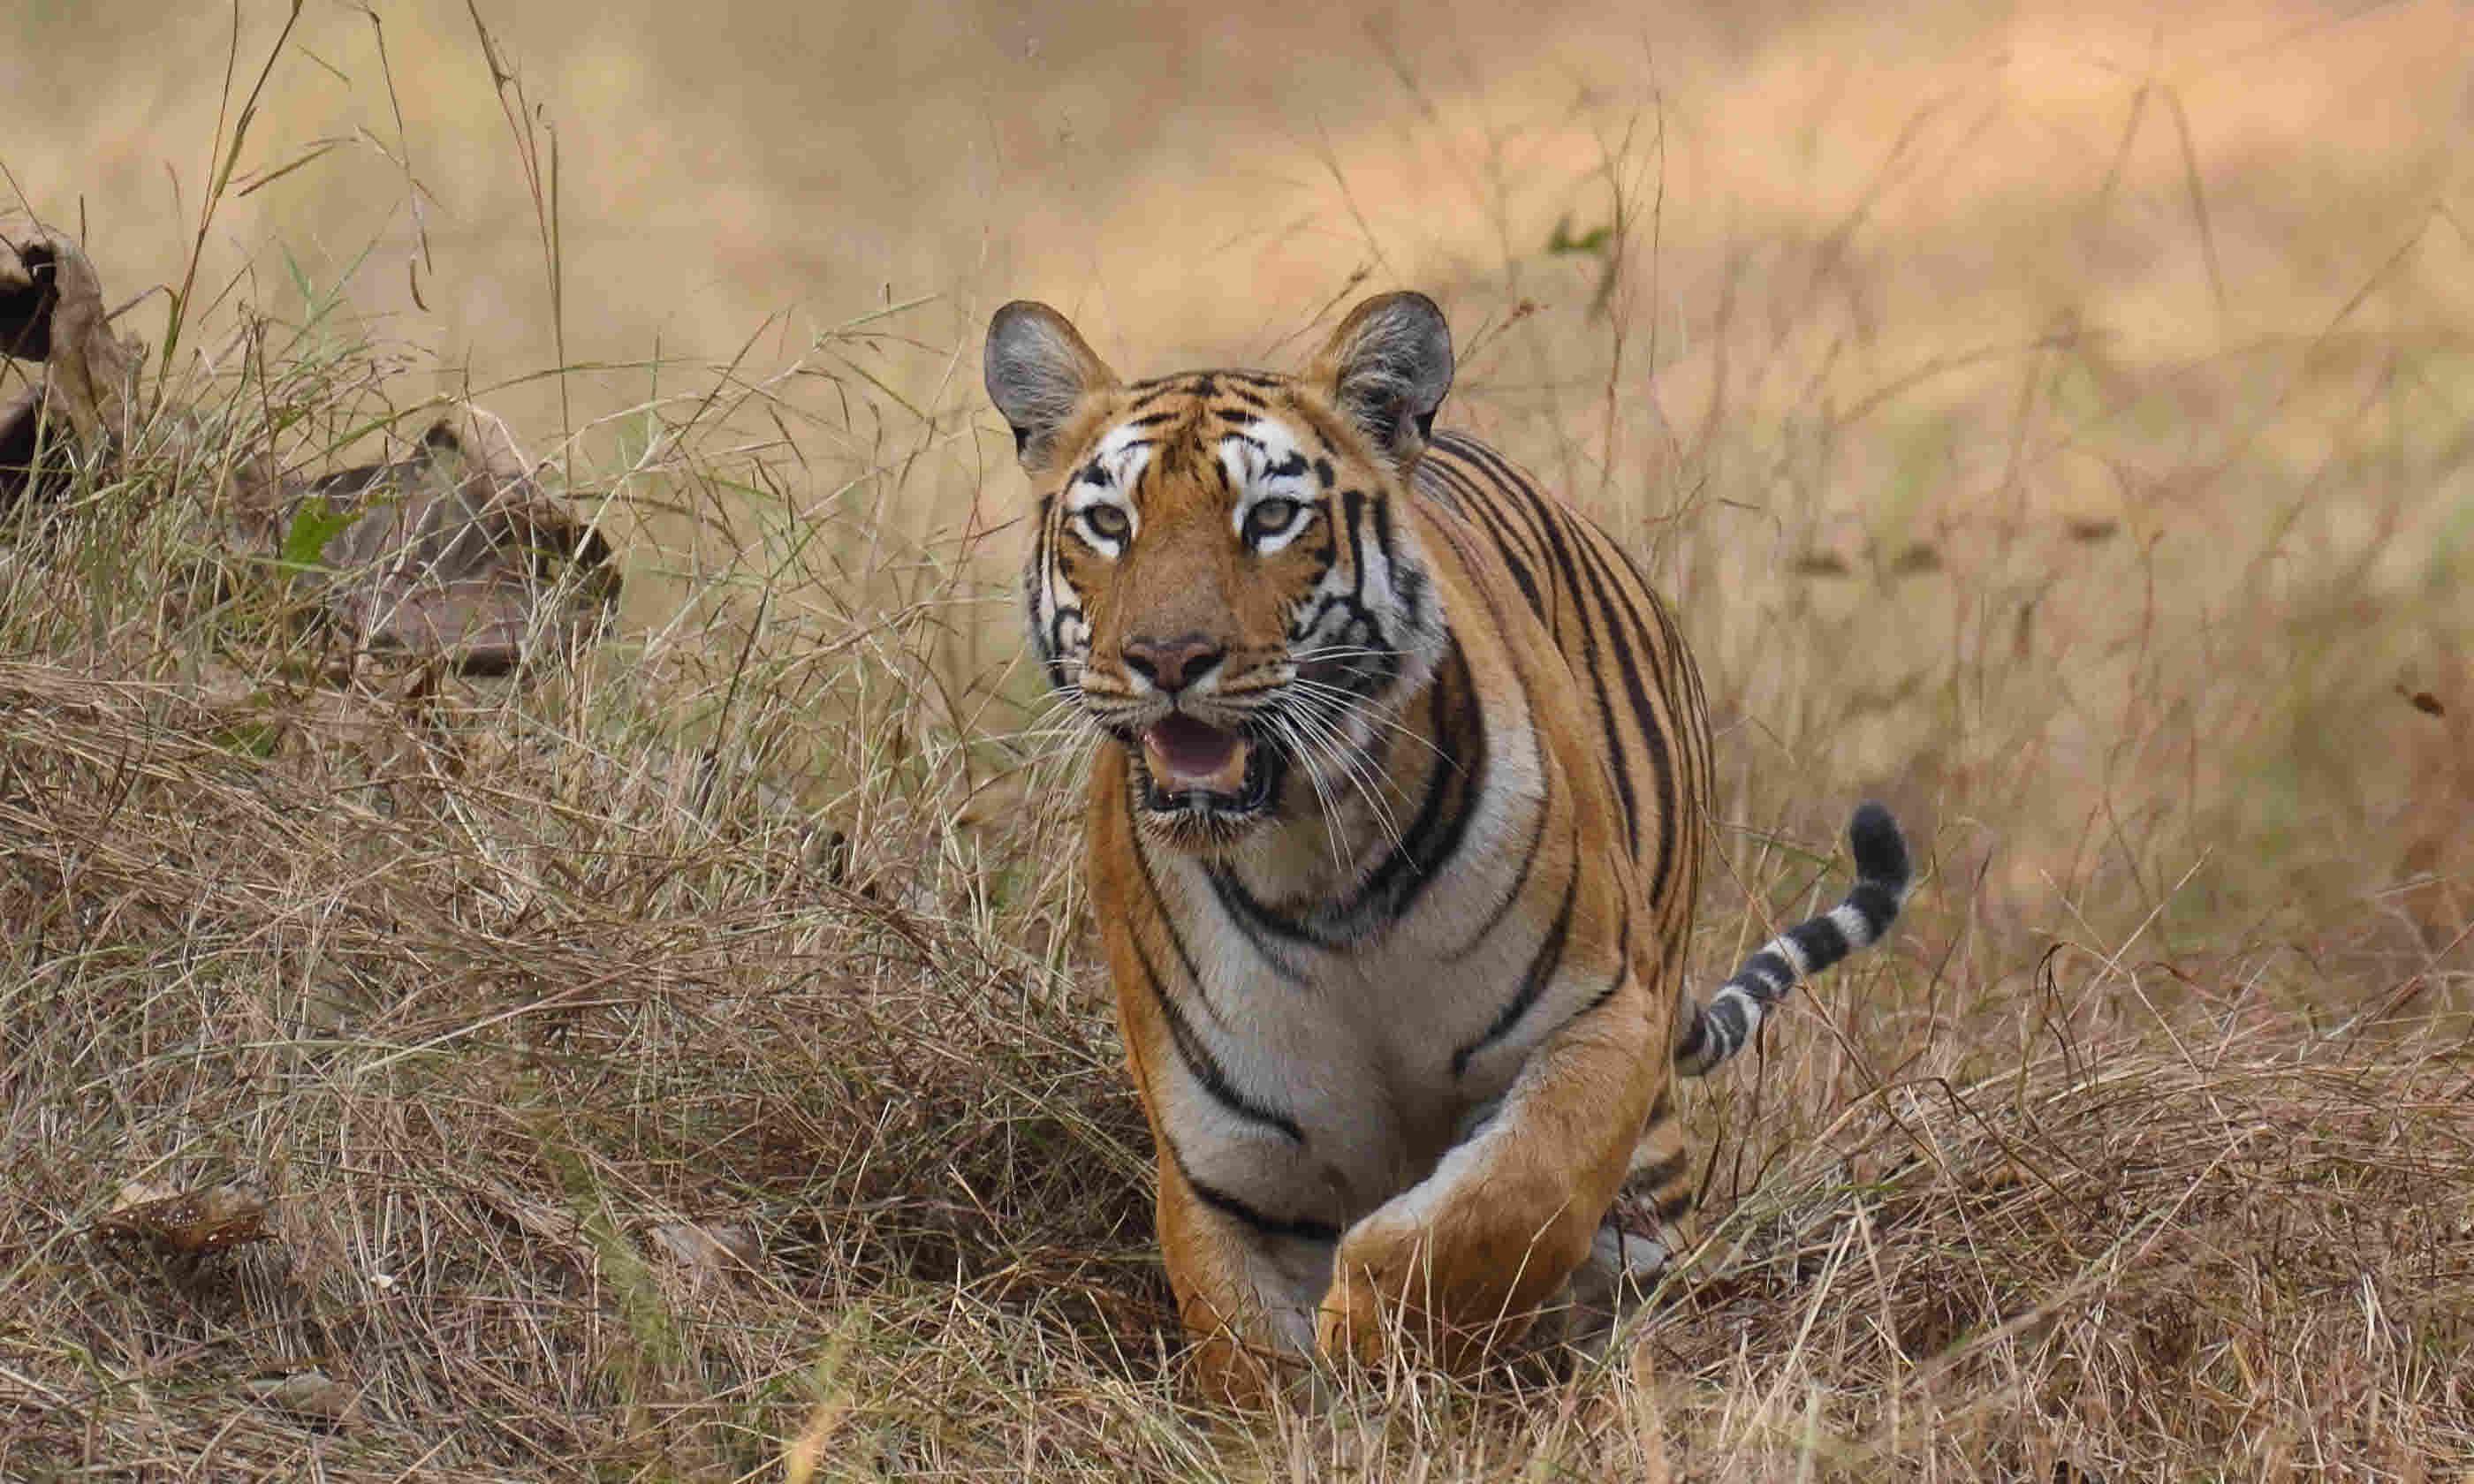 Tiger in Maharashtra, India (Shutterstock)